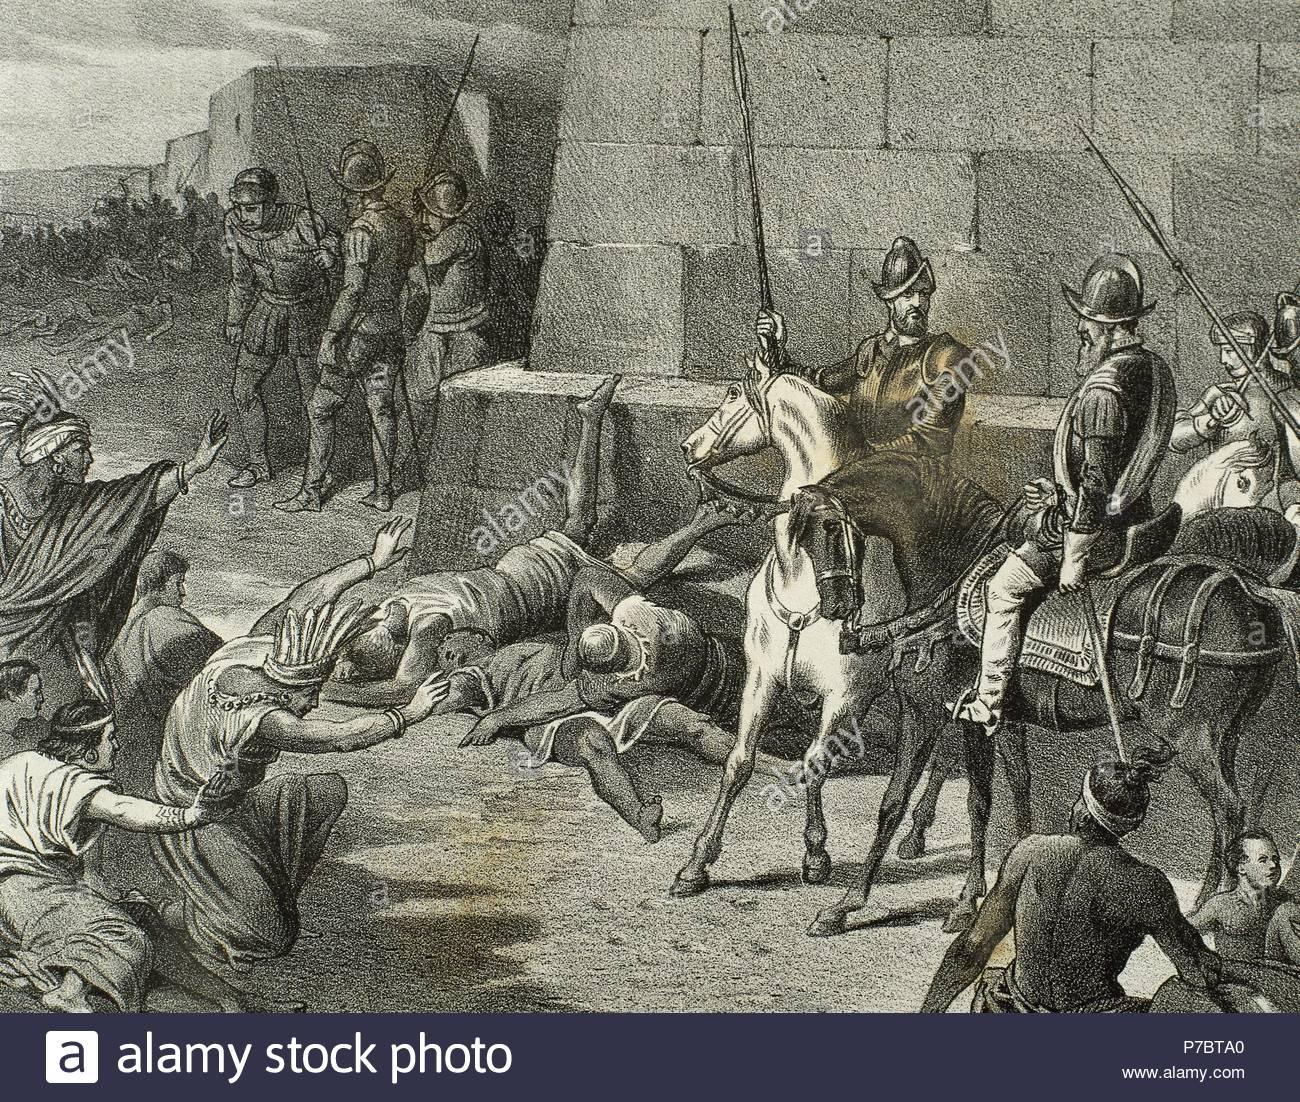 Atahualpa (1497-1533). Inca Emperor. Capture of the Inca ruler by